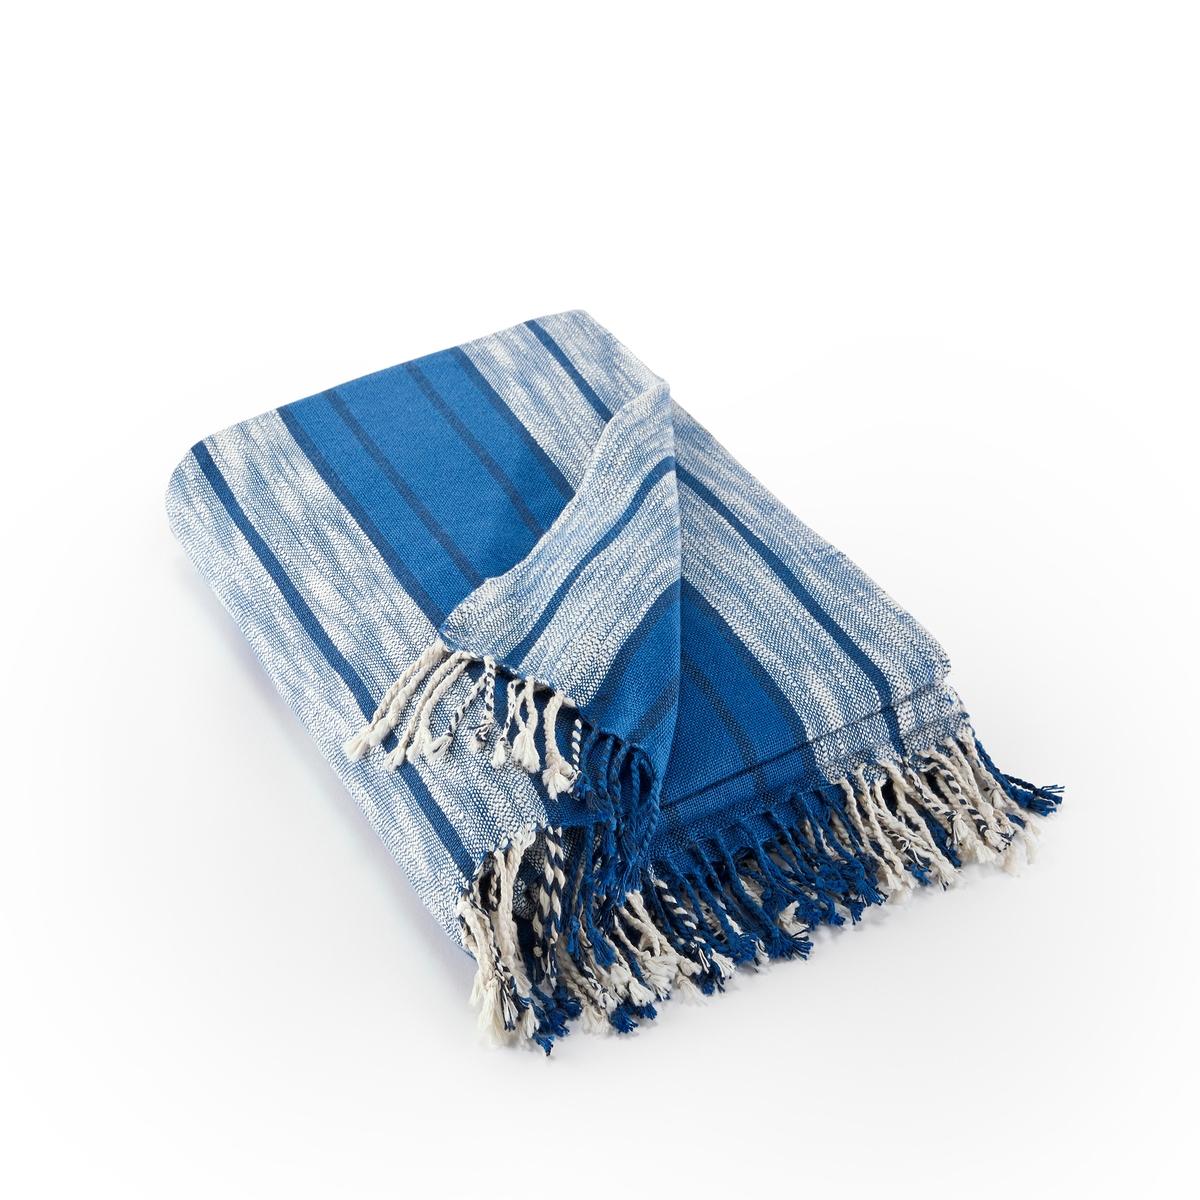 цена на Плед La Redoute В полоску с бахромой Luana 130 x 170 см синий